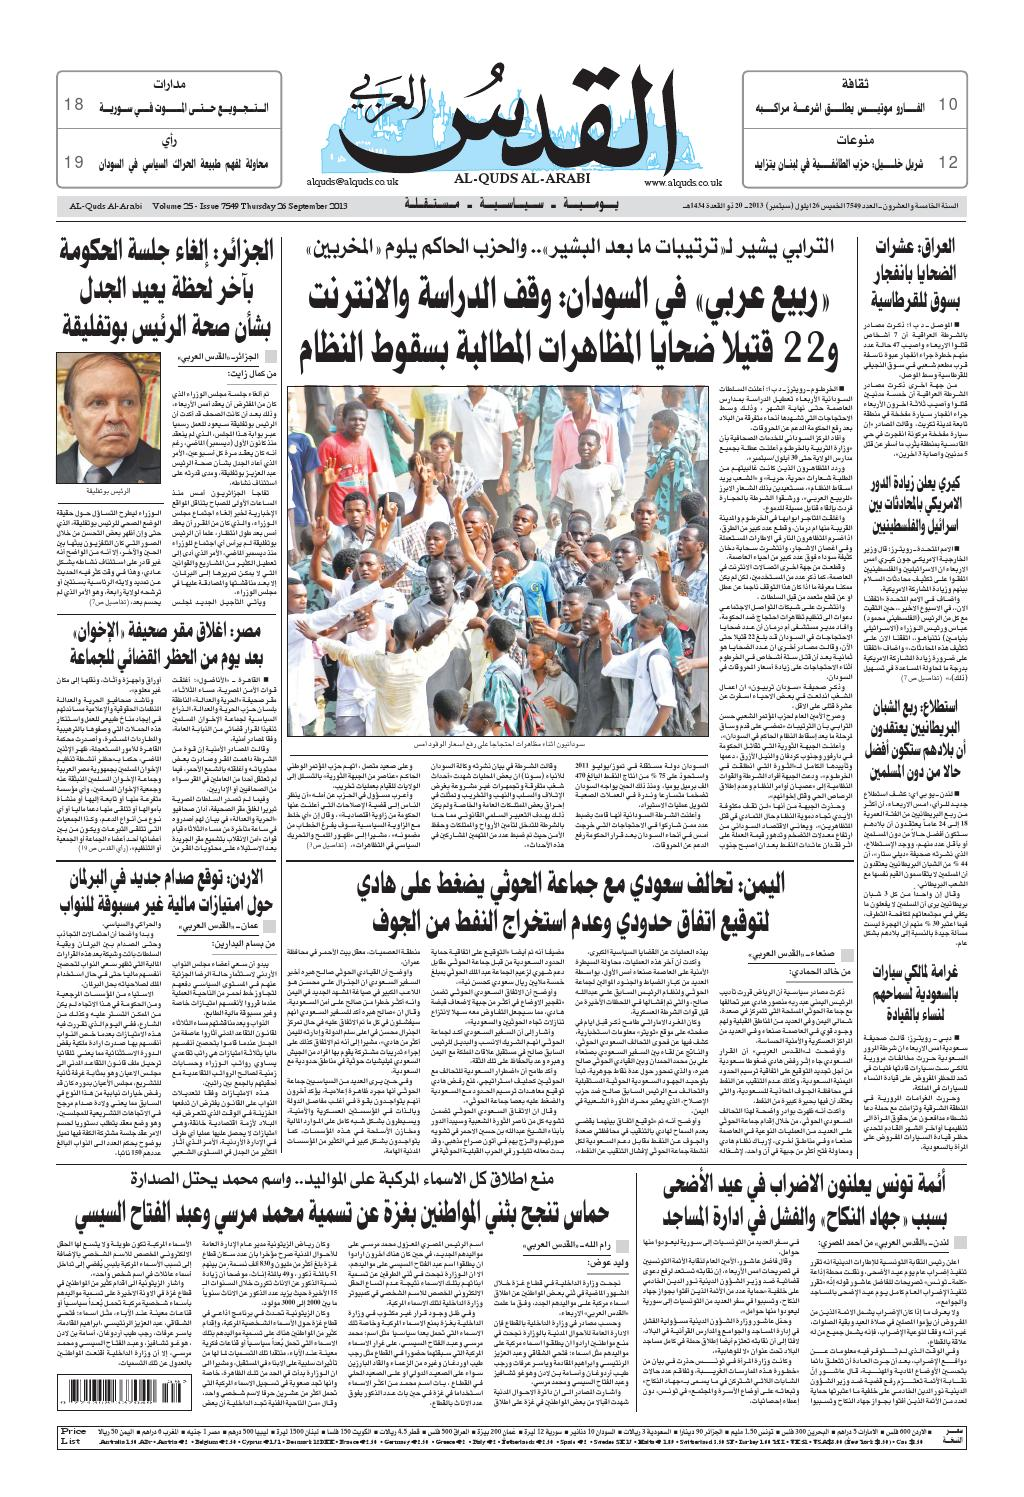 72fcfd581 صحيفة القدس العربي , الخميس 26.09.2013 by مركز الحدث - issuu